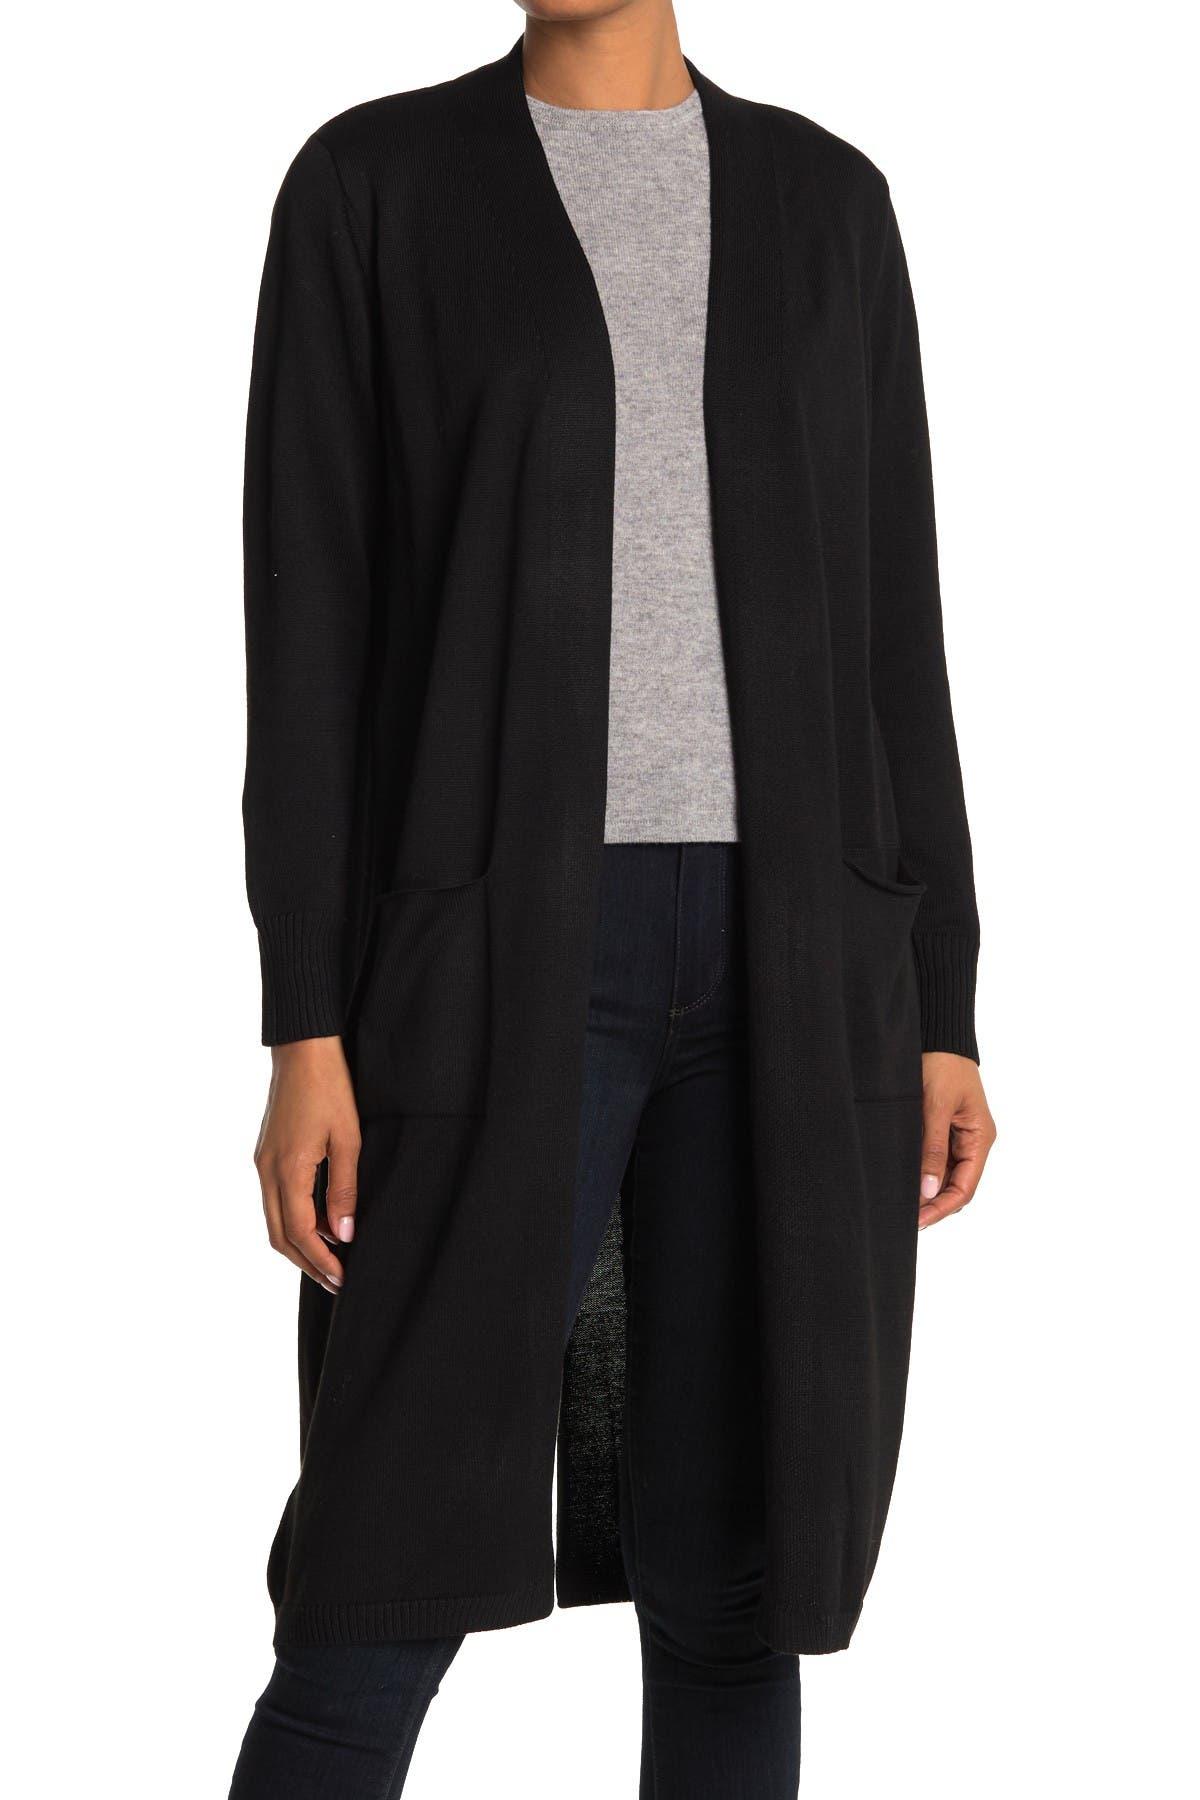 Image of Ceny Maxi Back Vent Cardigan Sweater